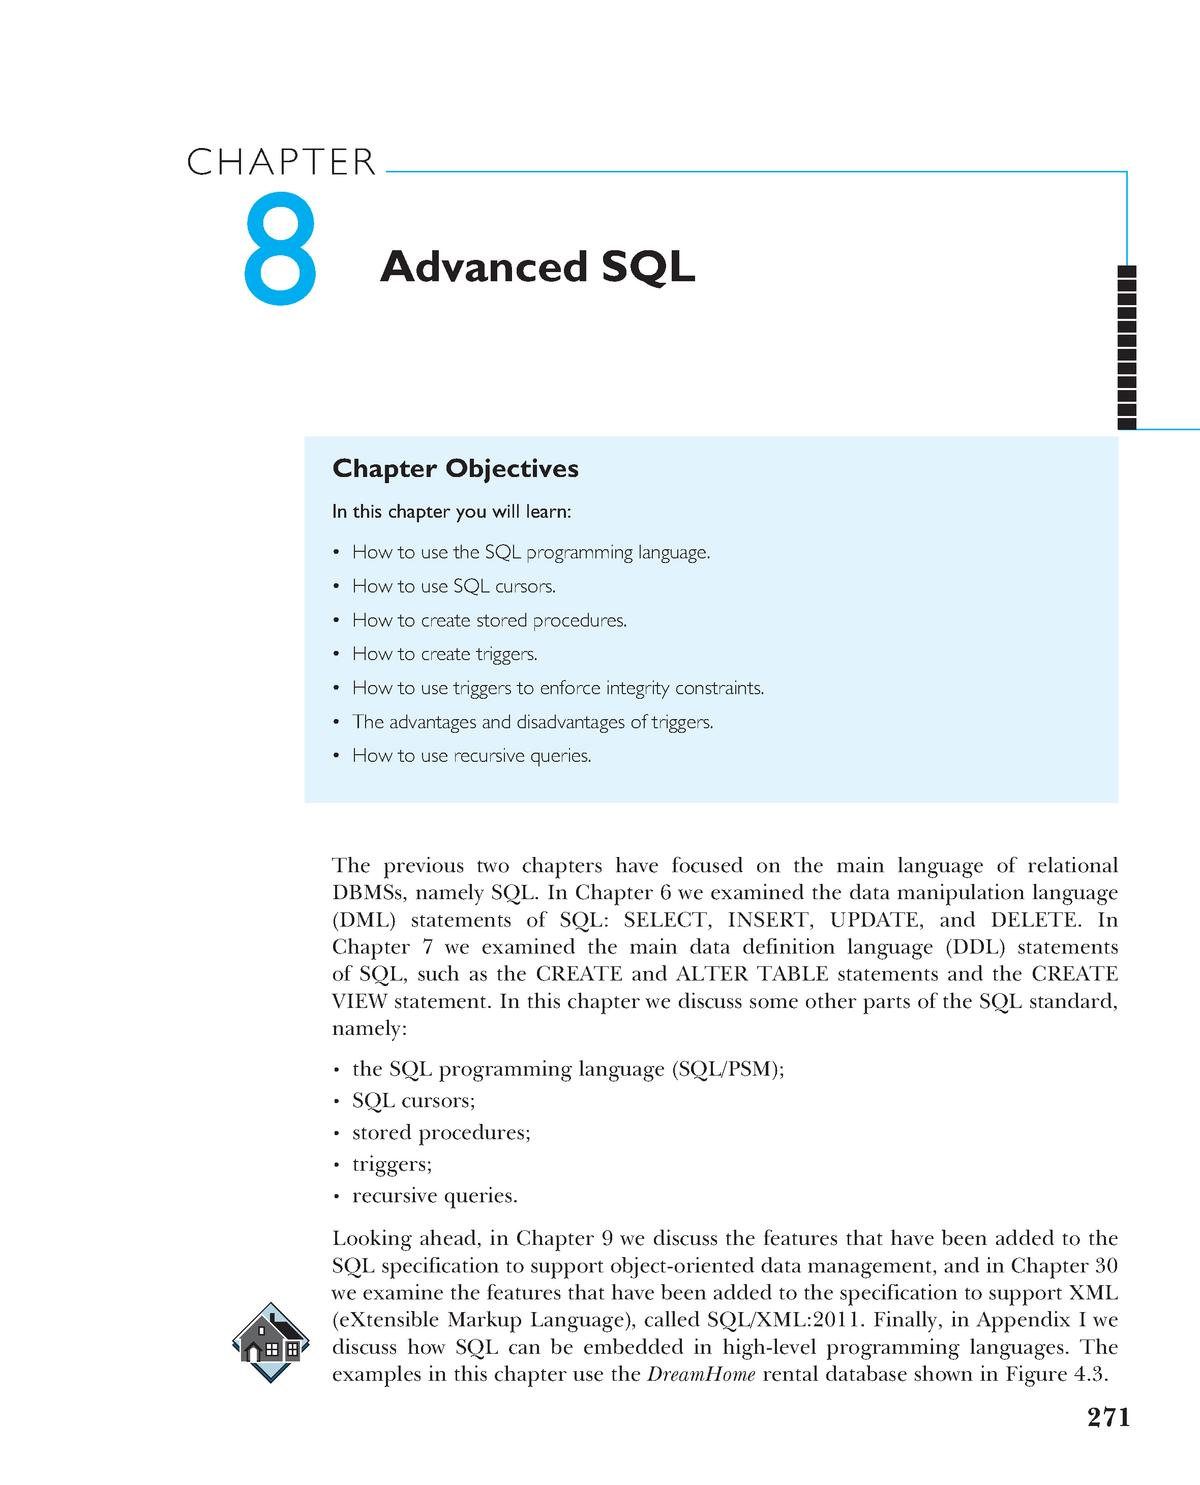 Chapter 08 Advanced SQL - ITC423: Database Systems - StuDocu